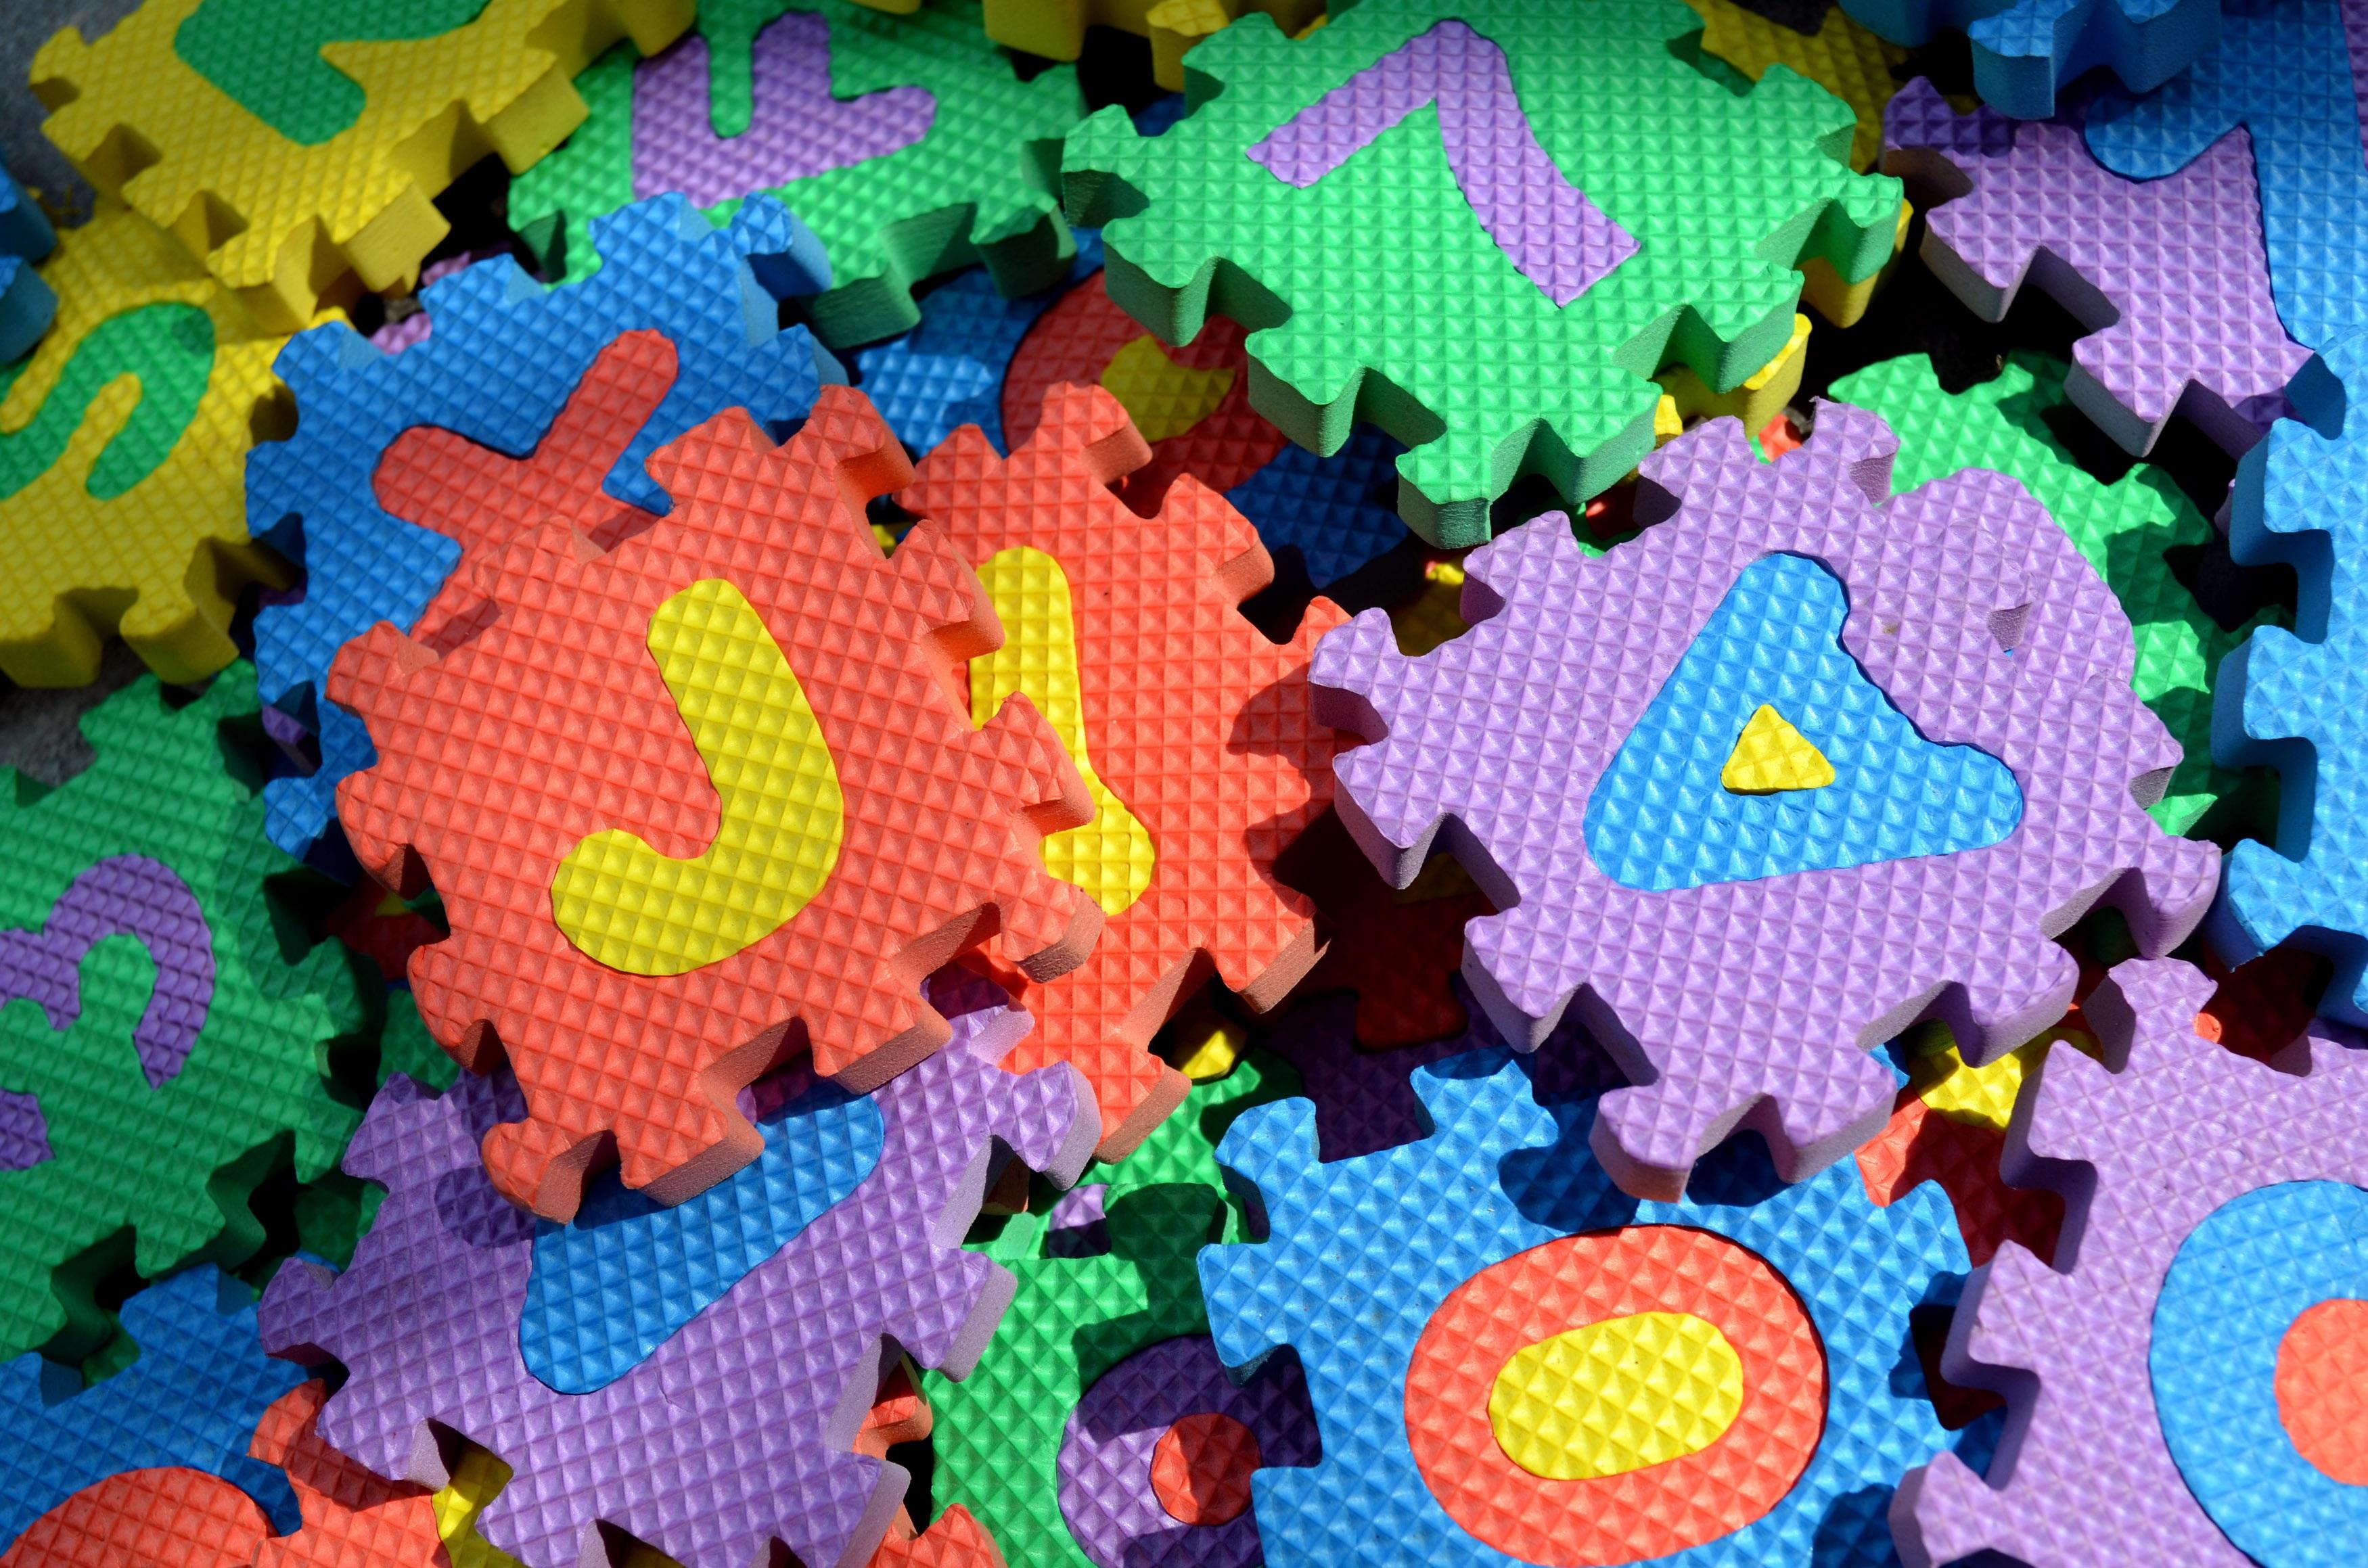 Kostenlose foto : Muster, Farbe, Kreis, häkeln, Textil-, Kunst ...